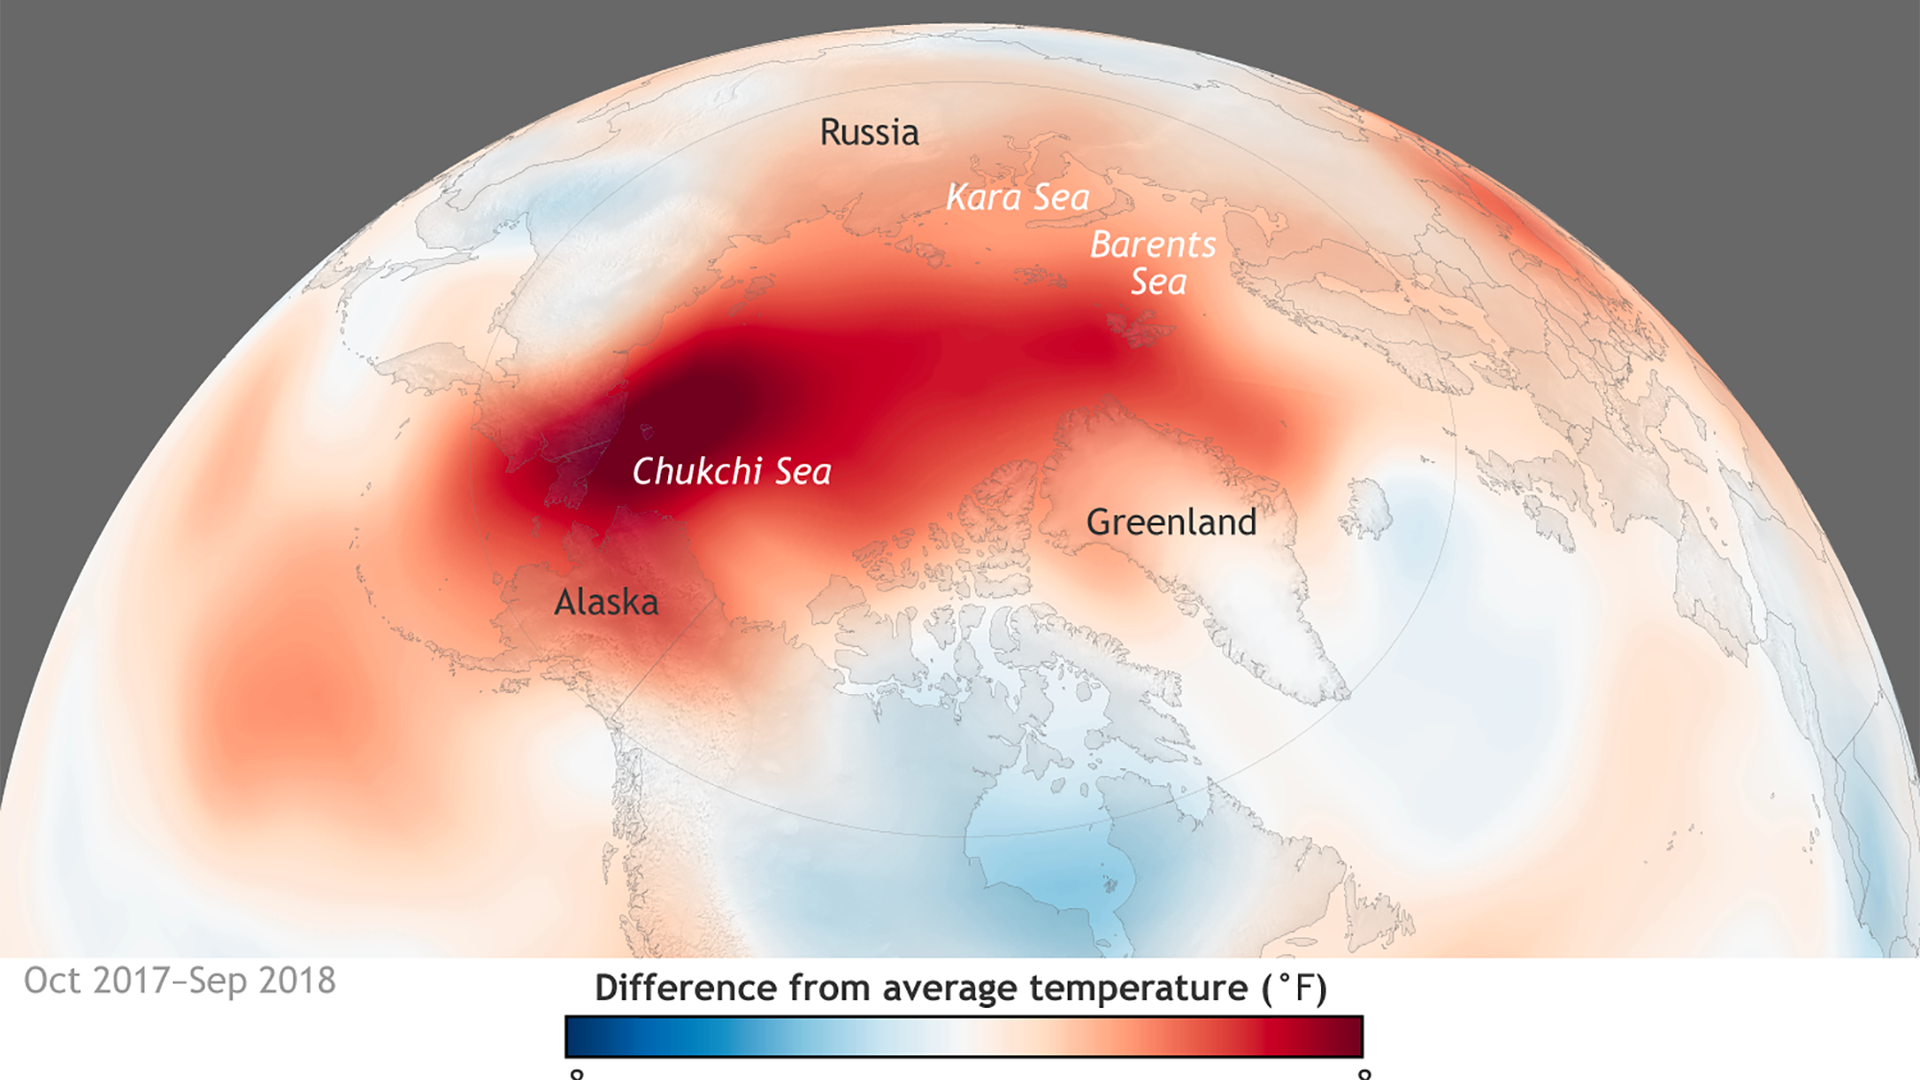 Heat map of Arctic surface temperature anomalies